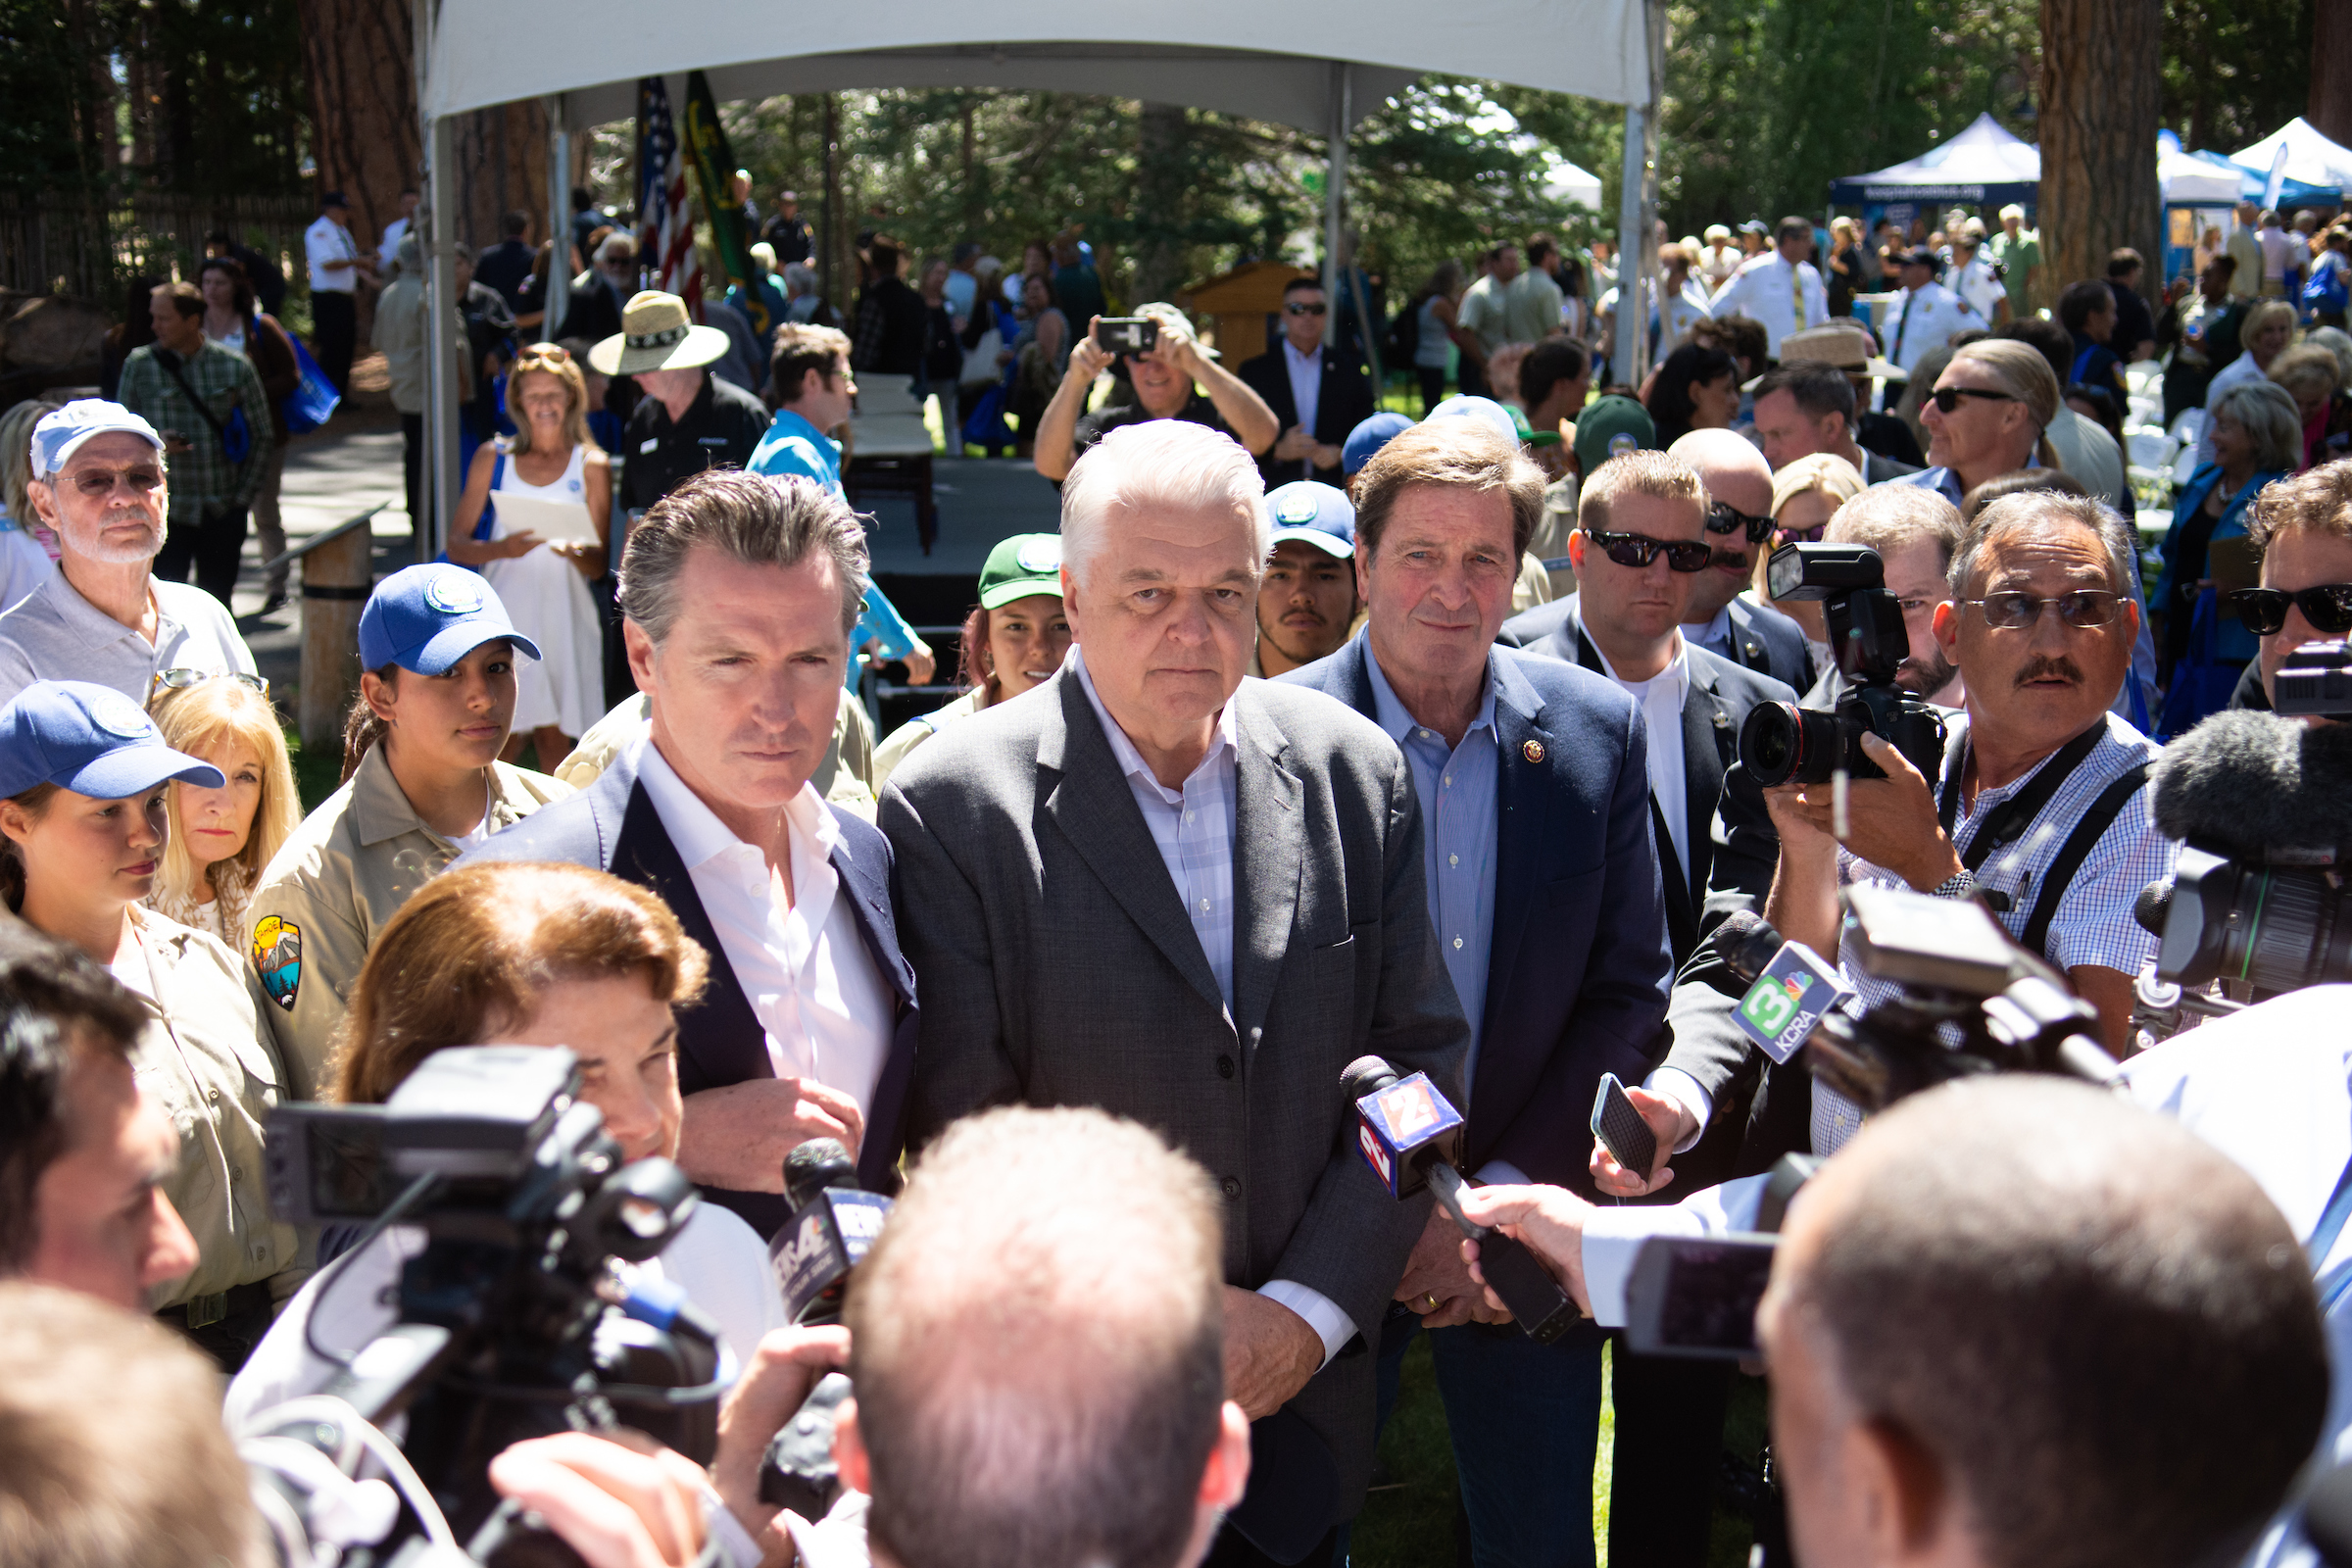 Gov. Gavin Newsom (D-Calif.), Gov. Steve Sisolak (D-Nev.) and Congressman John Garamendi (D-Calif.) answer questions after the Tahoe Summit